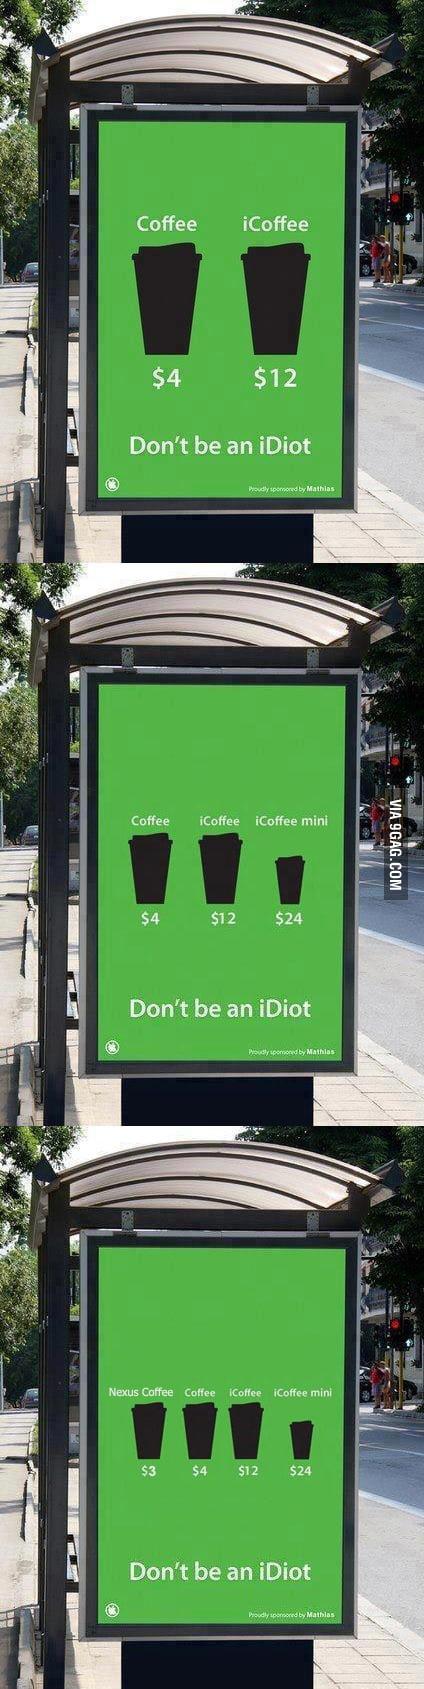 Dont' Be an iDiot...wait